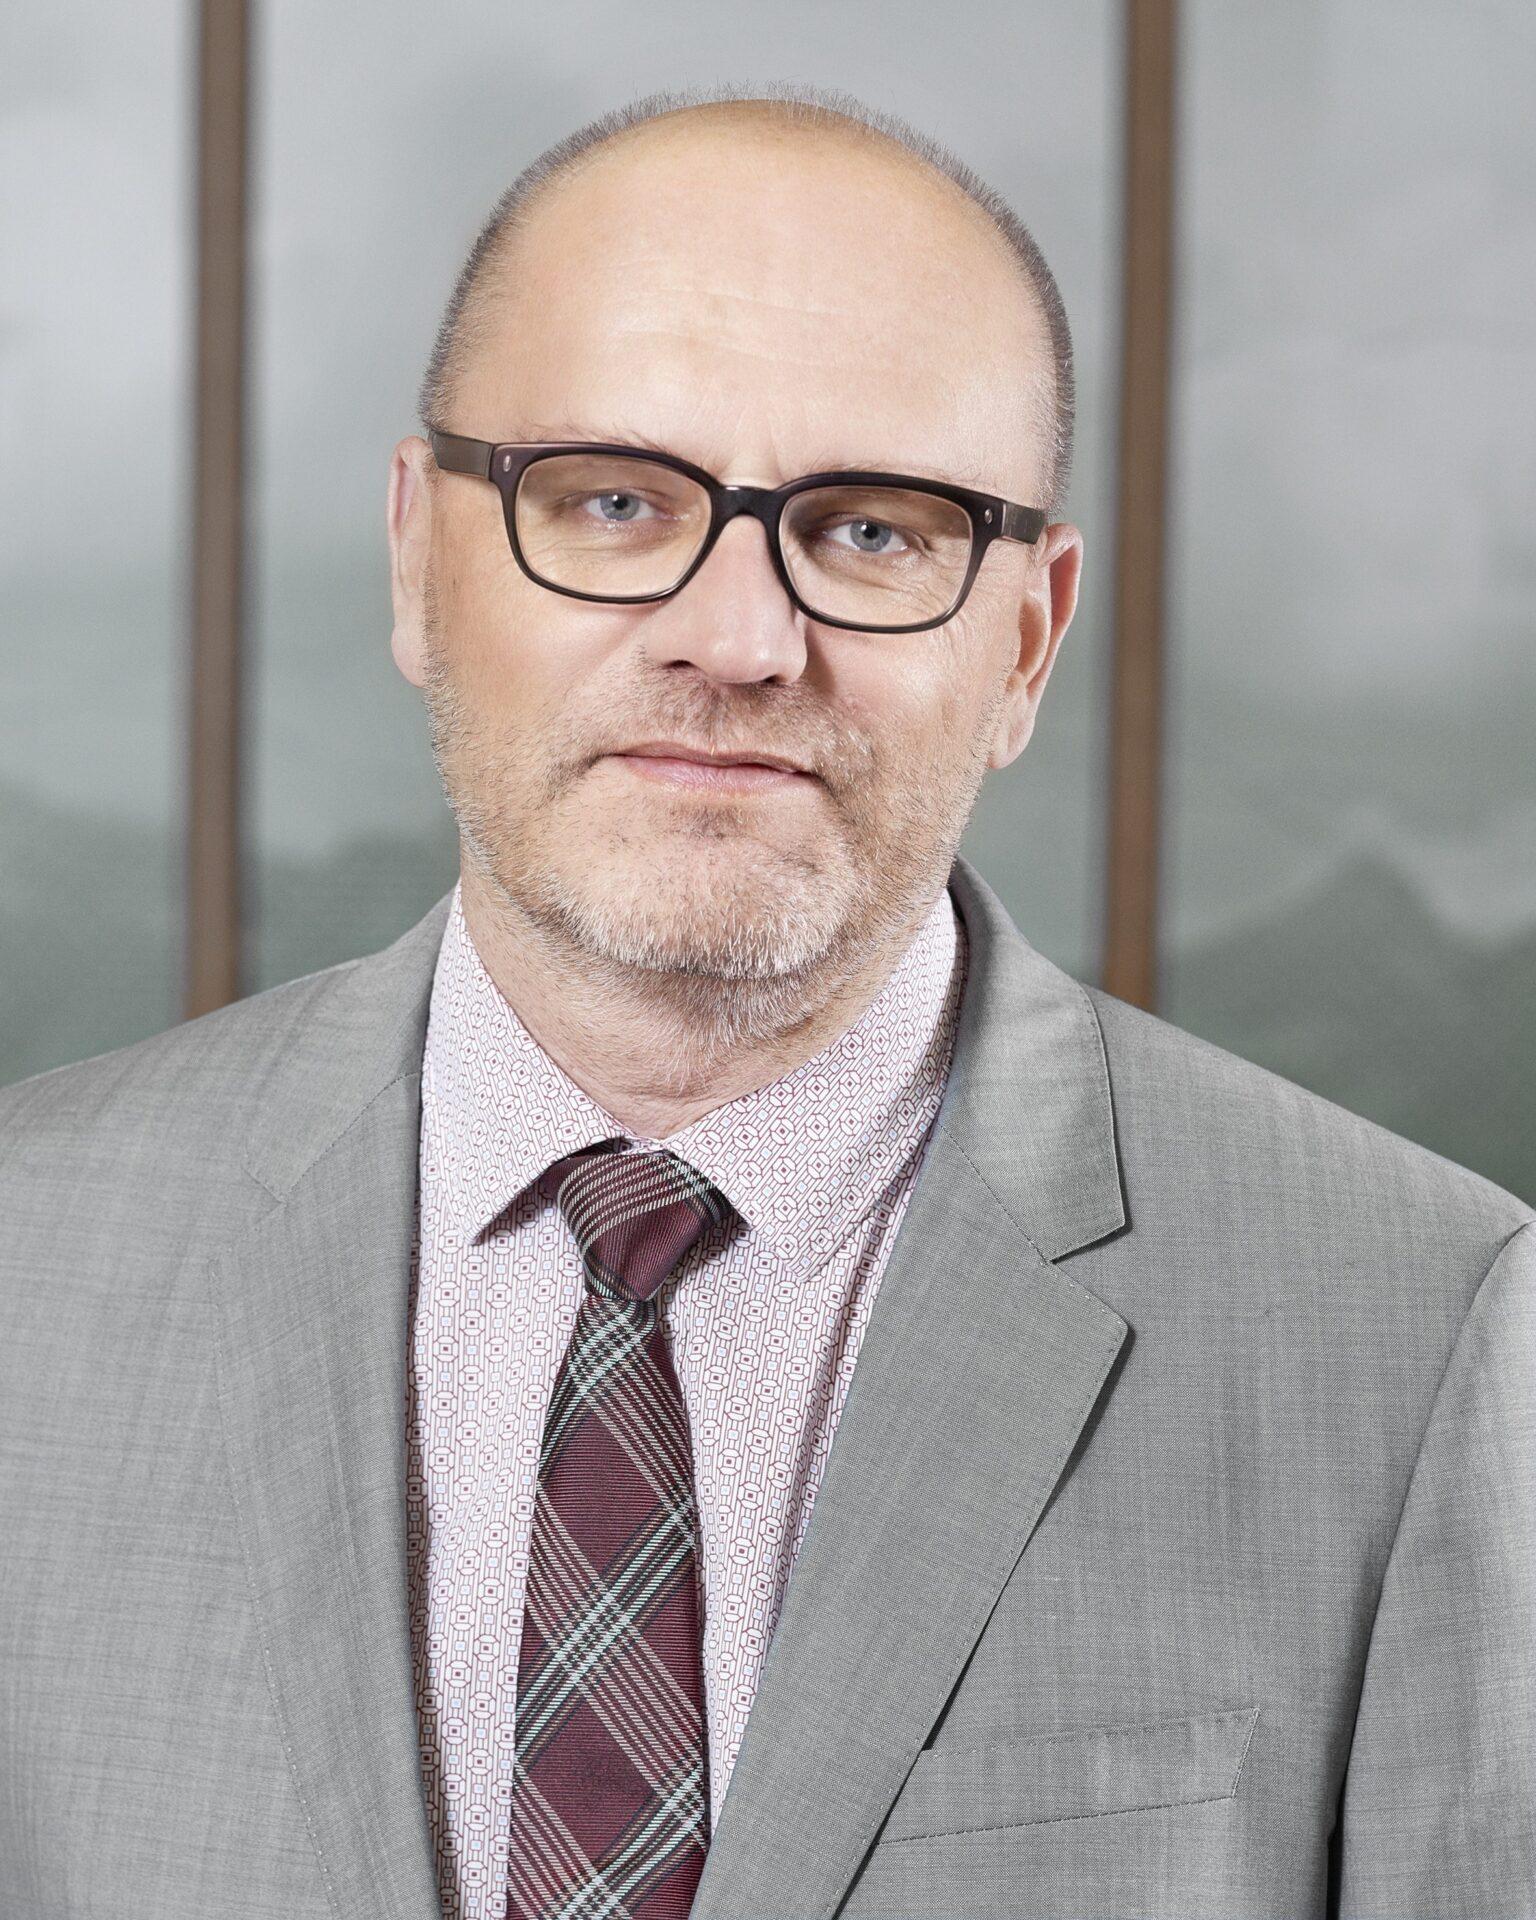 Jean-Luc Cochard